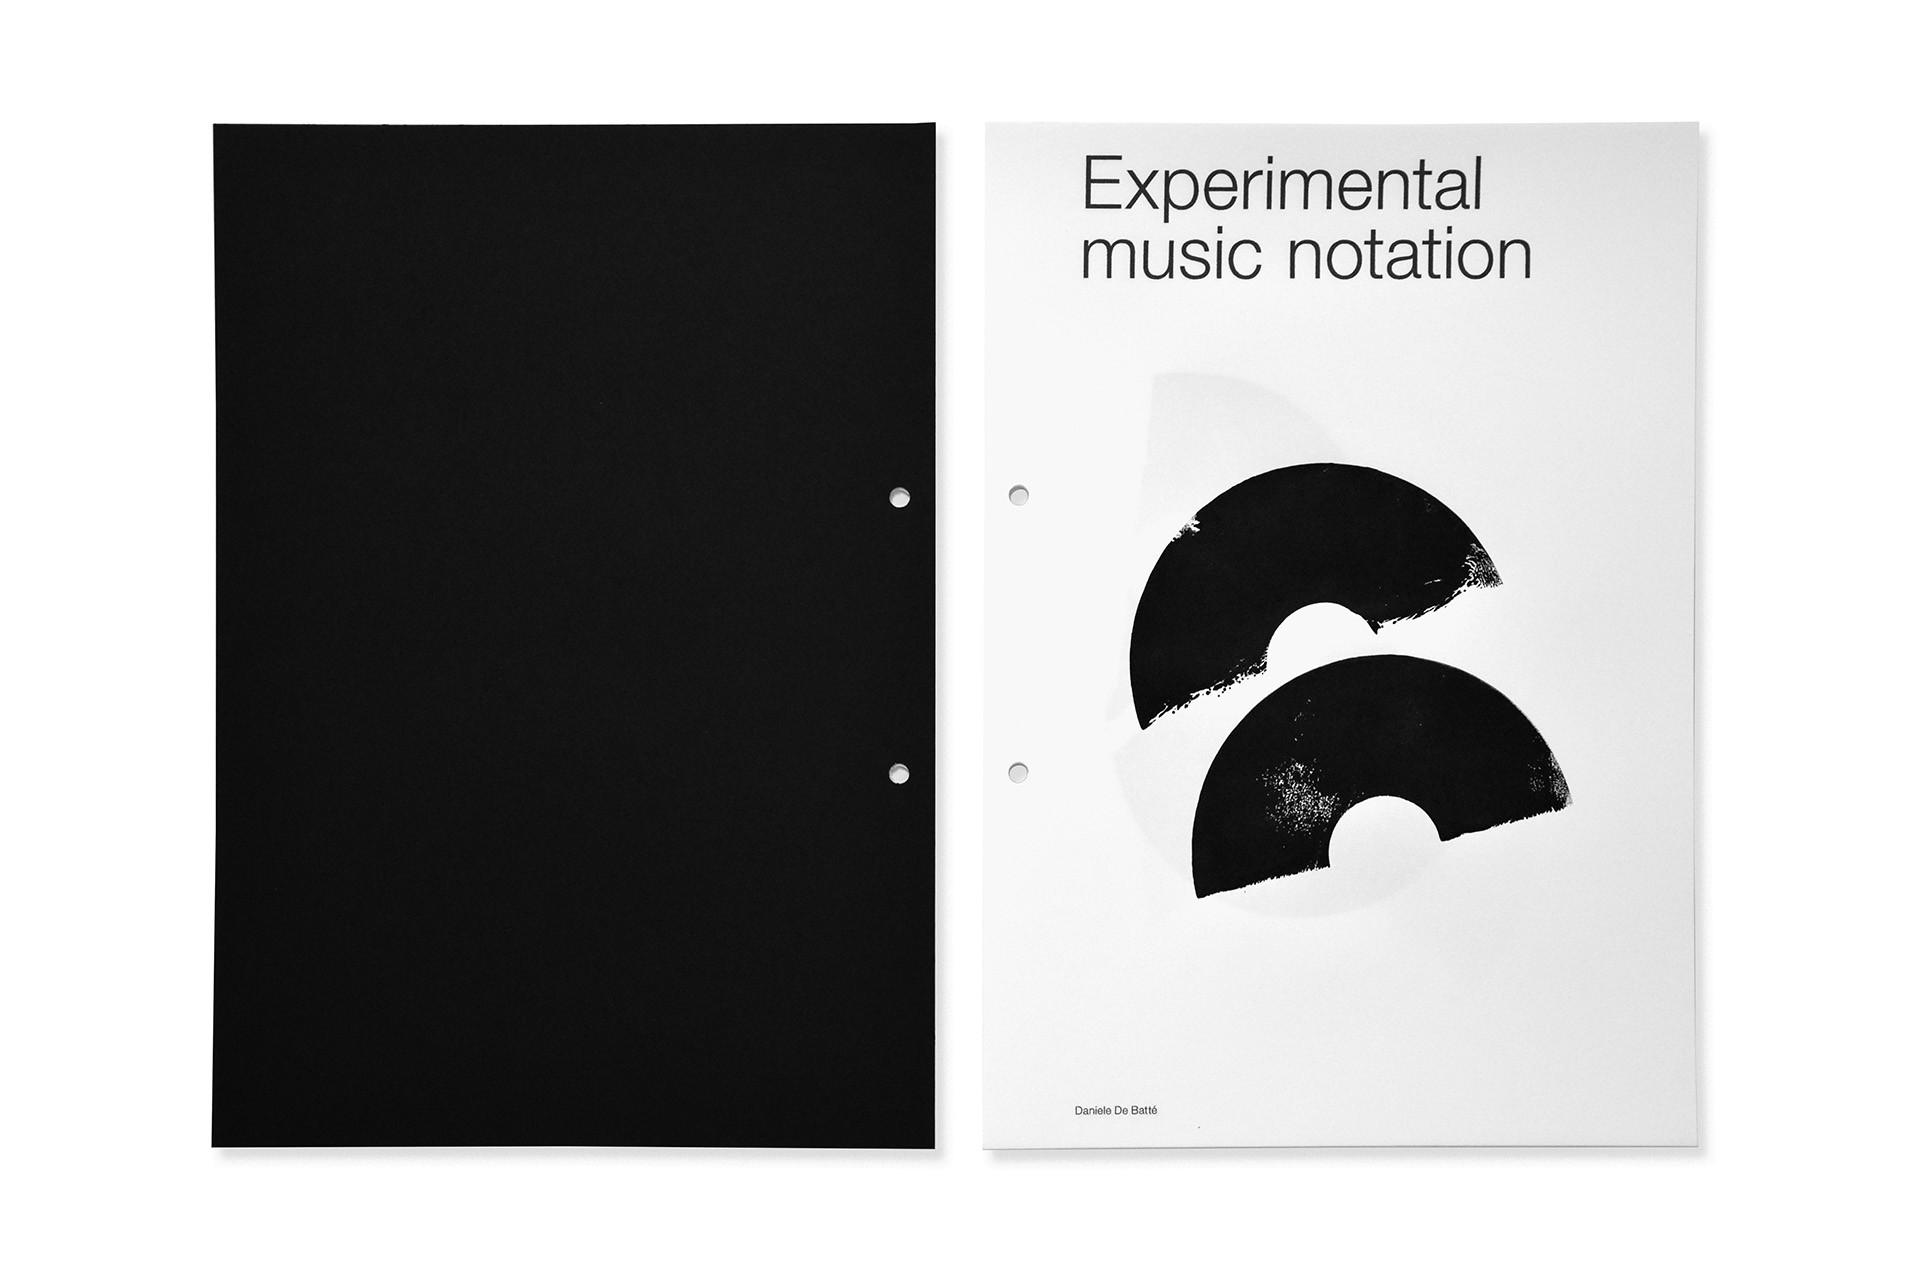 DDB Experimental music notation 26.6.2016